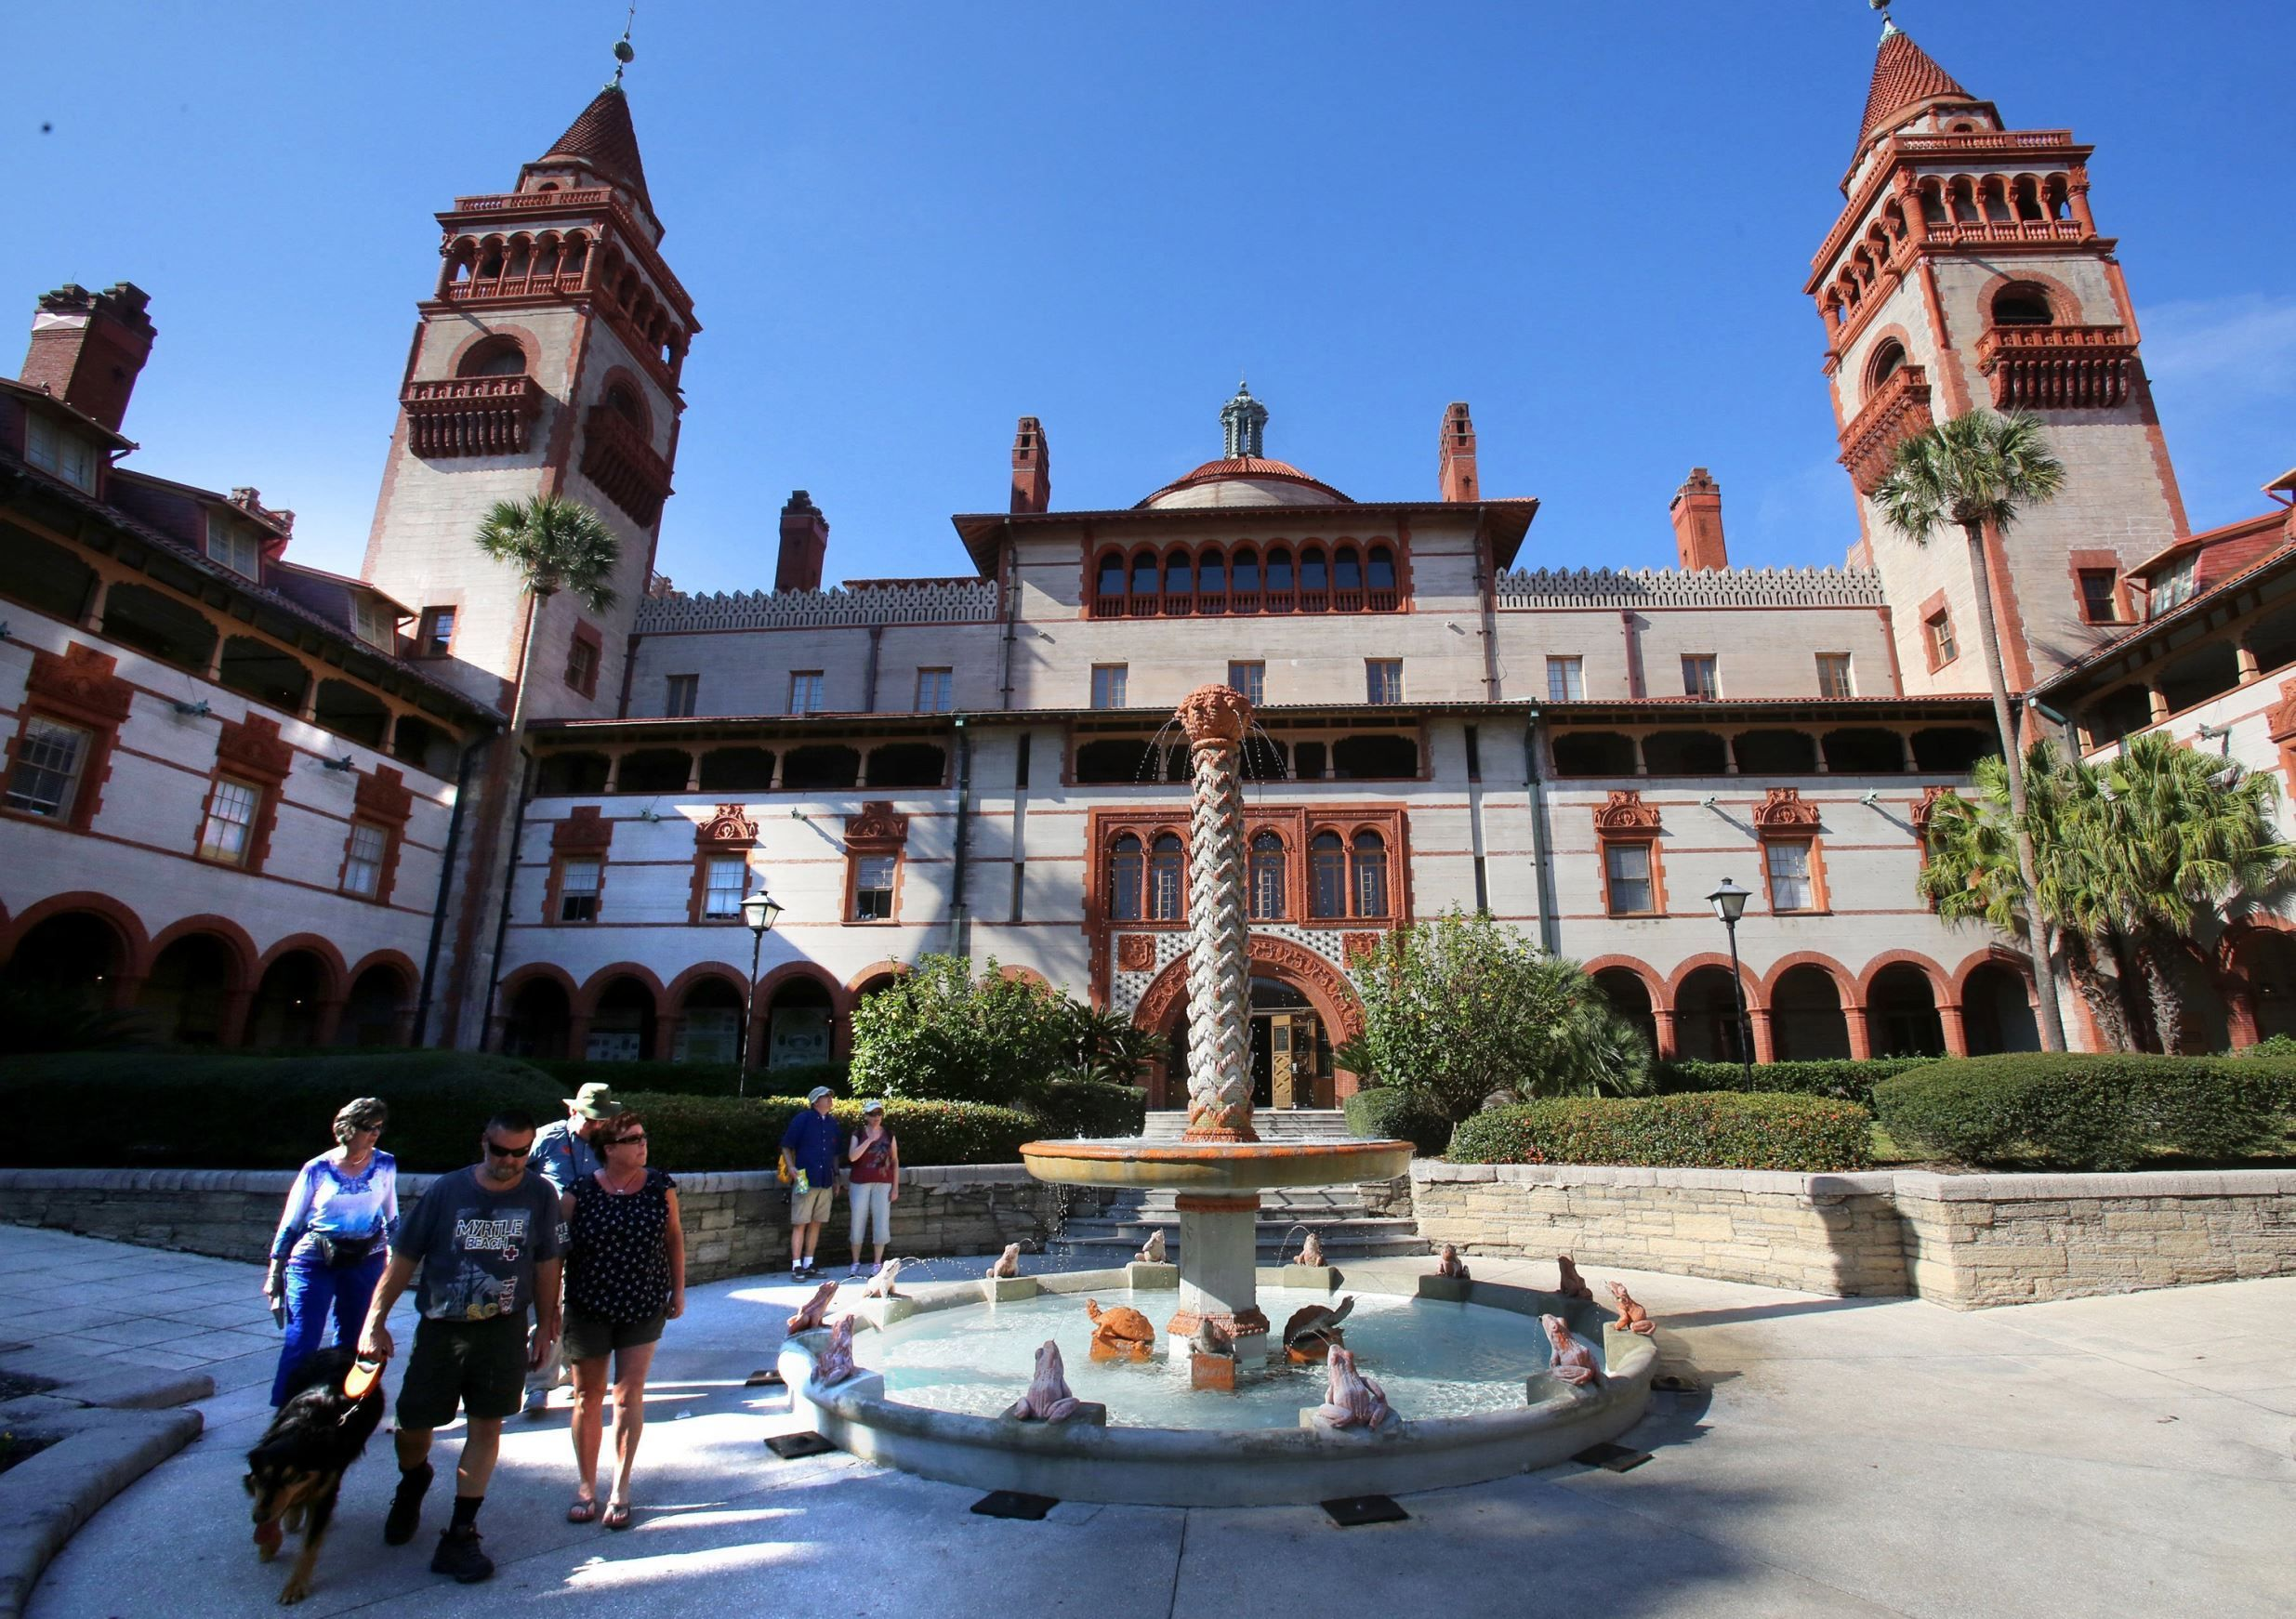 Historic Flagler College in St. Augustine, Fla. - Joe Burbank/Orlando Sentinel/MCT